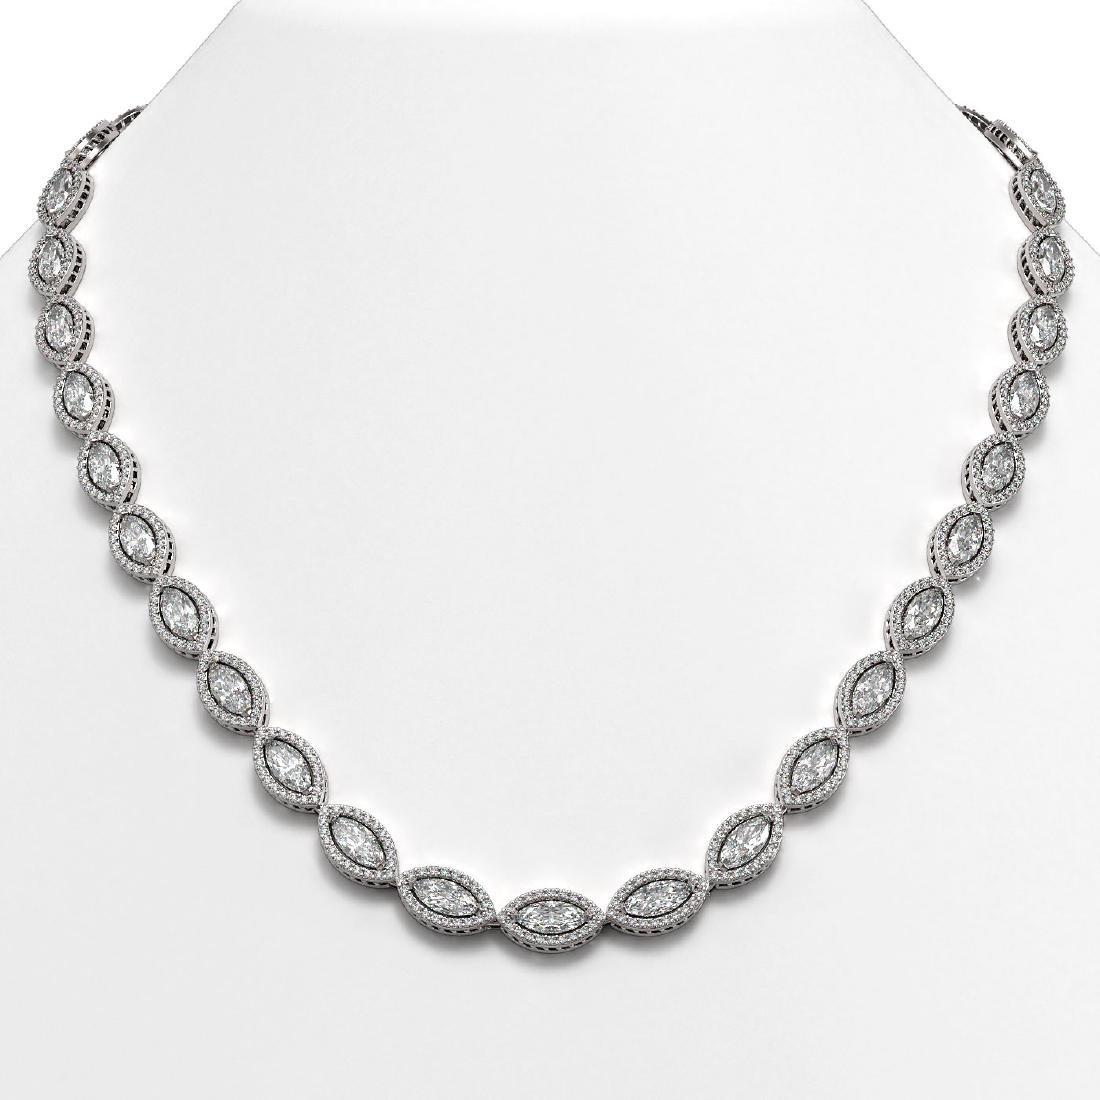 28.12 CTW Marquise Diamond Designer Necklace 18K White